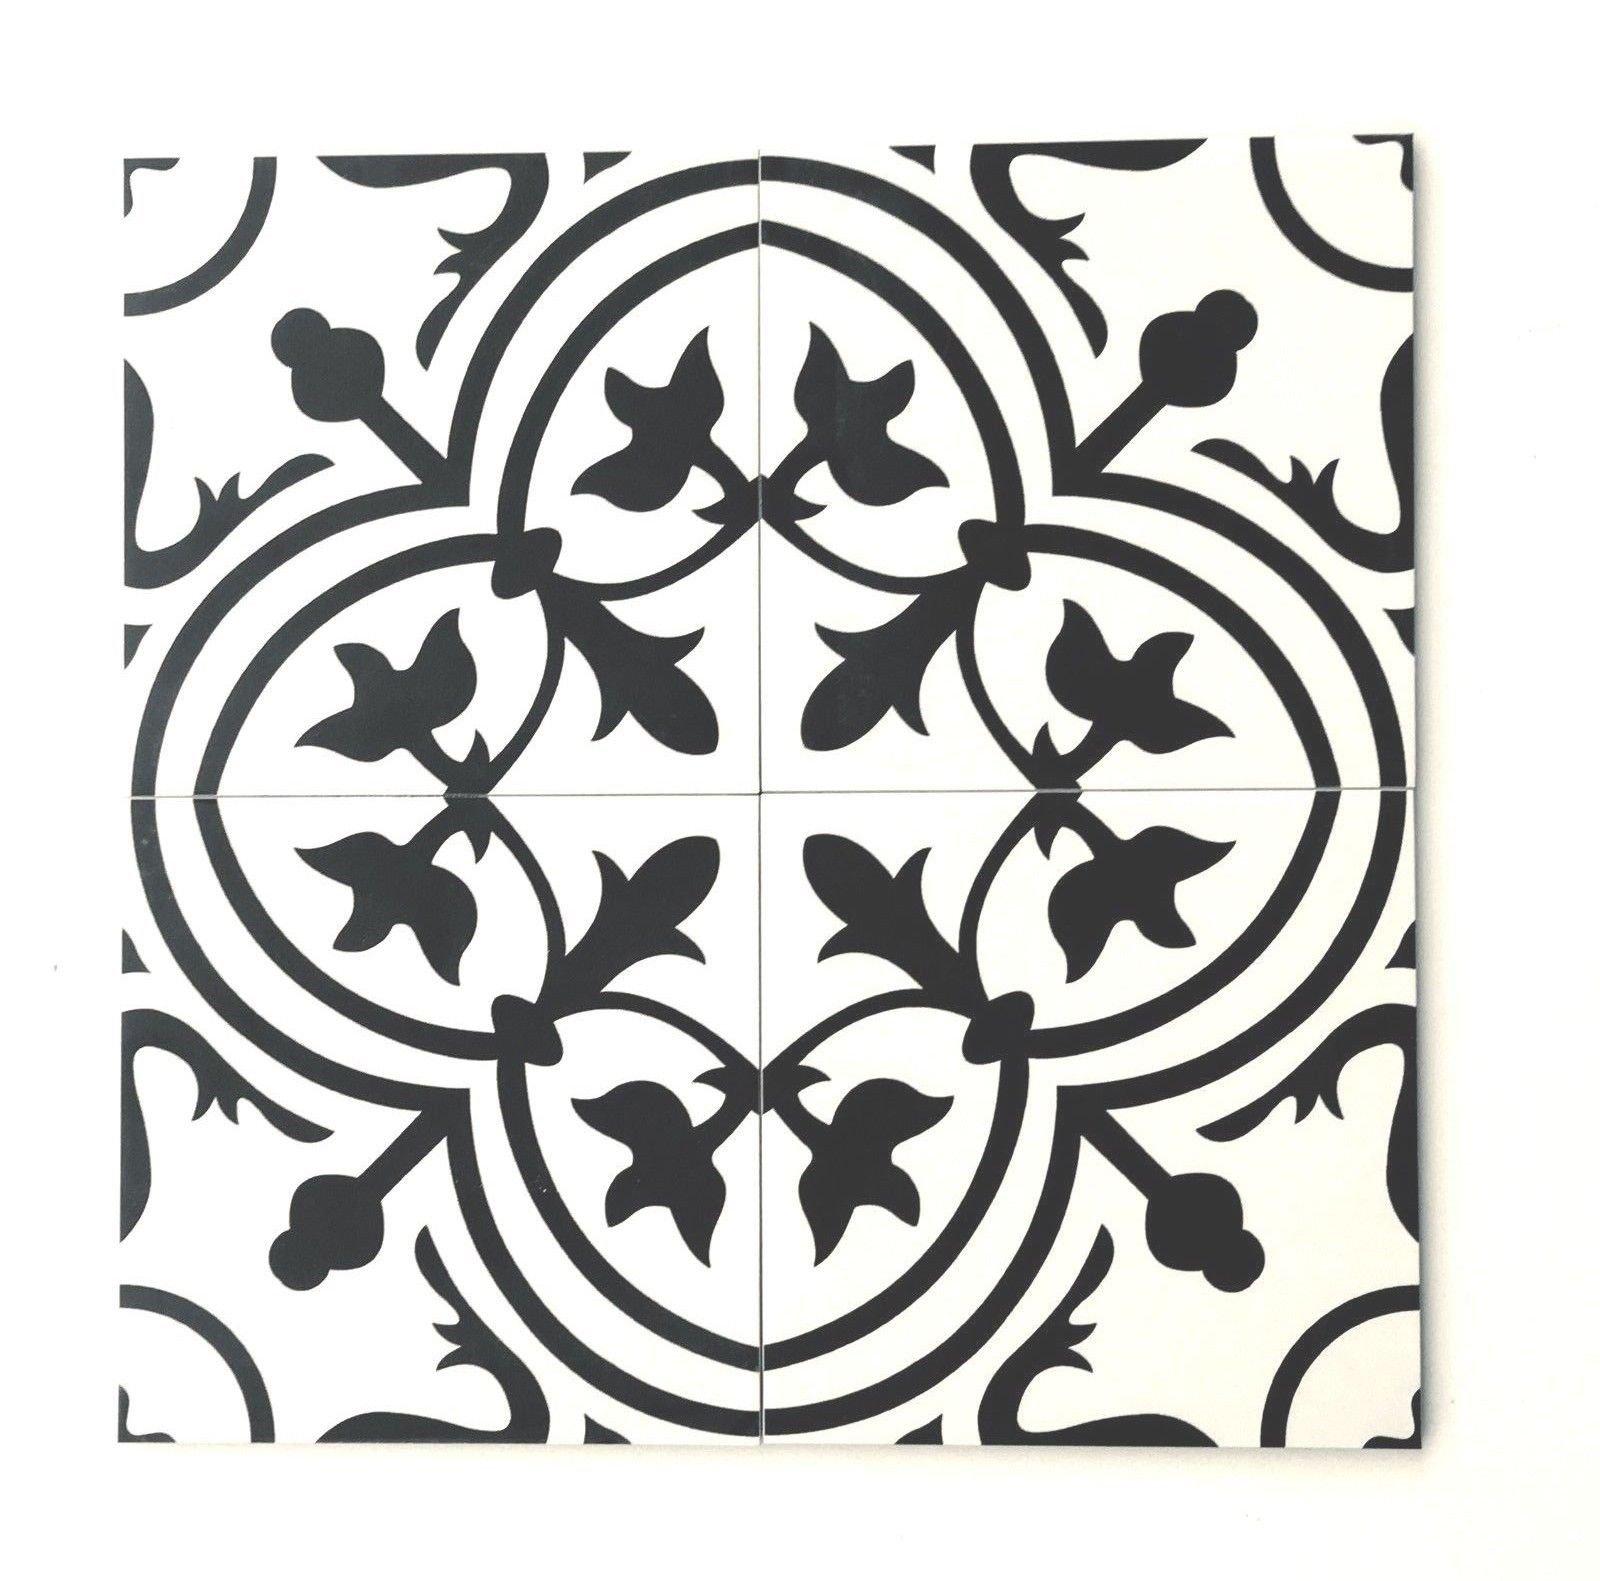 8x8 flora black white porcelain tile by squarefeet depot 10pcs